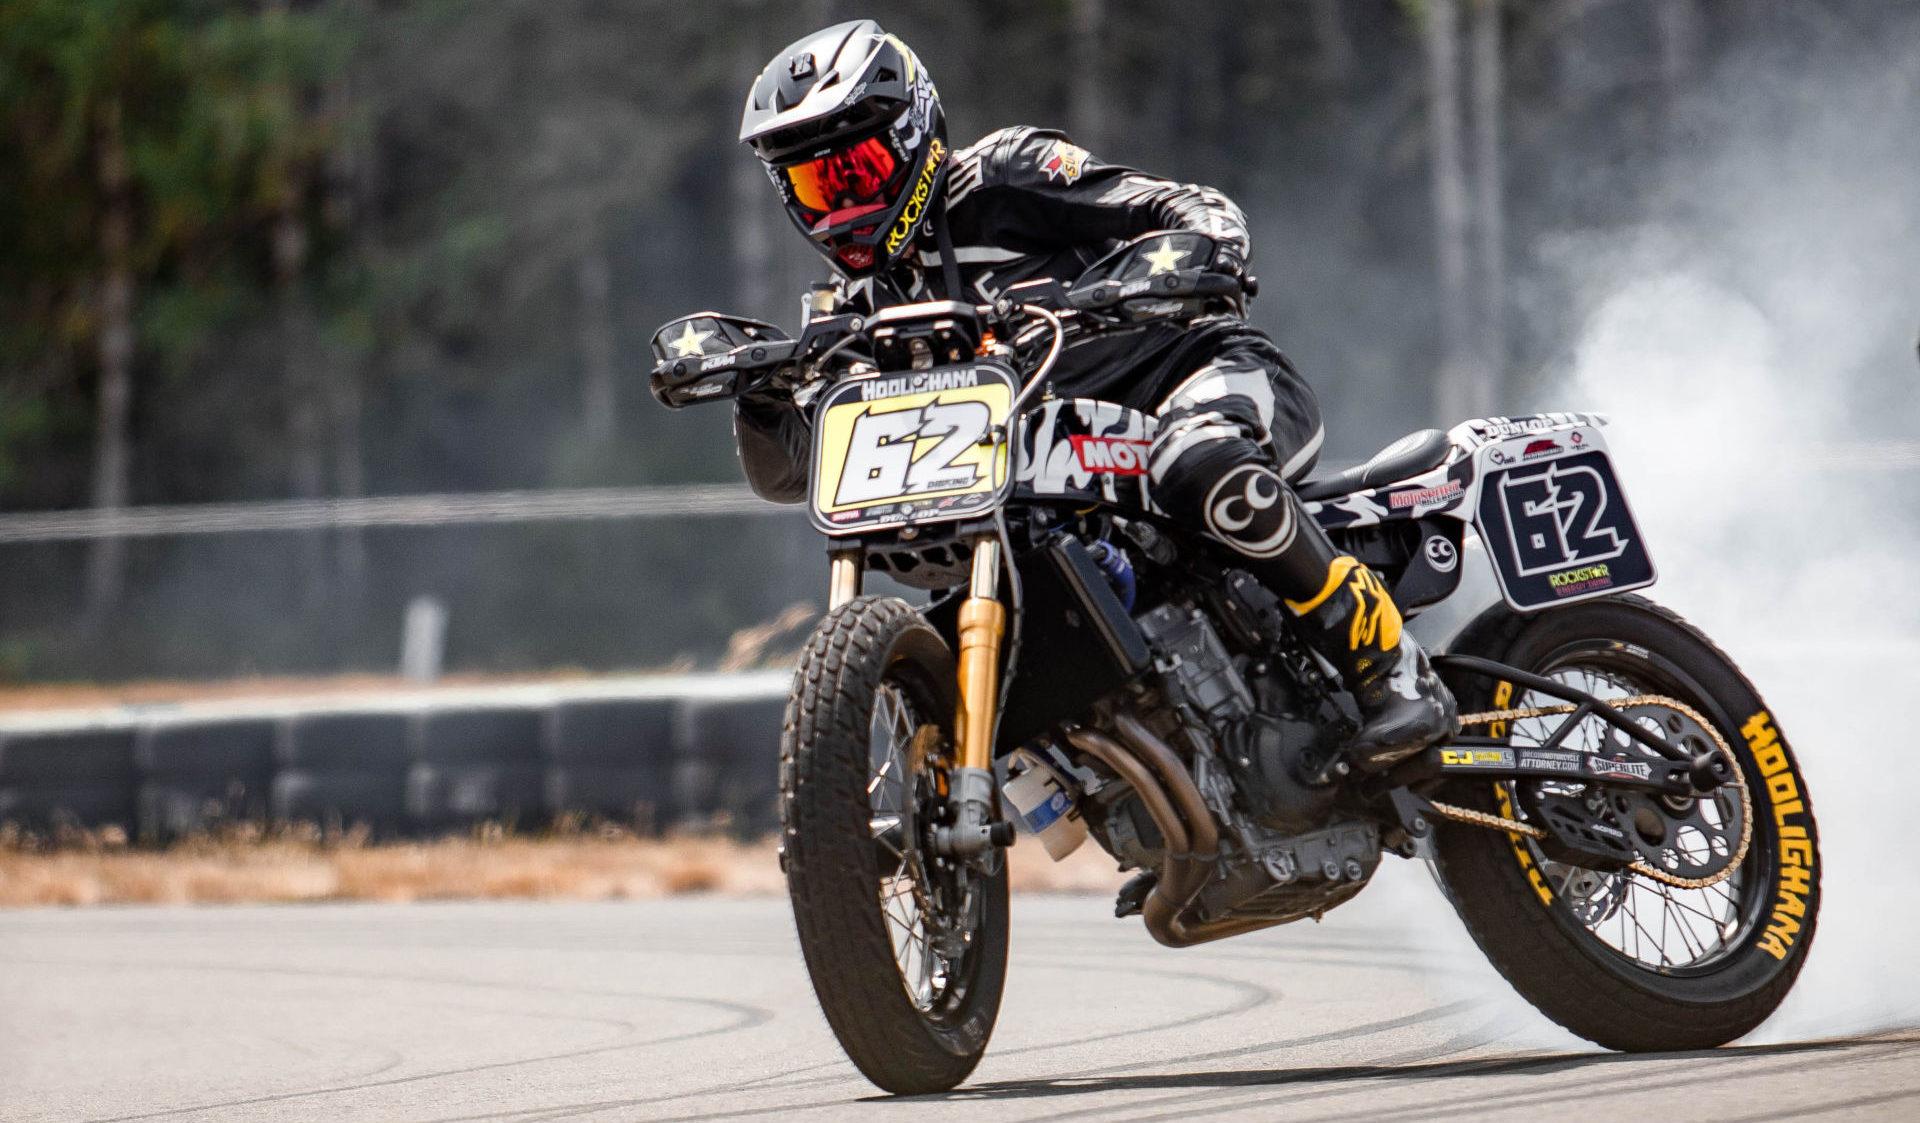 Pro road racer and dirt tracker Andy DiBrino drifts a KTM 790 Duke at Ridge Motorsports Park. Photo courtesy Andy DiBrino.